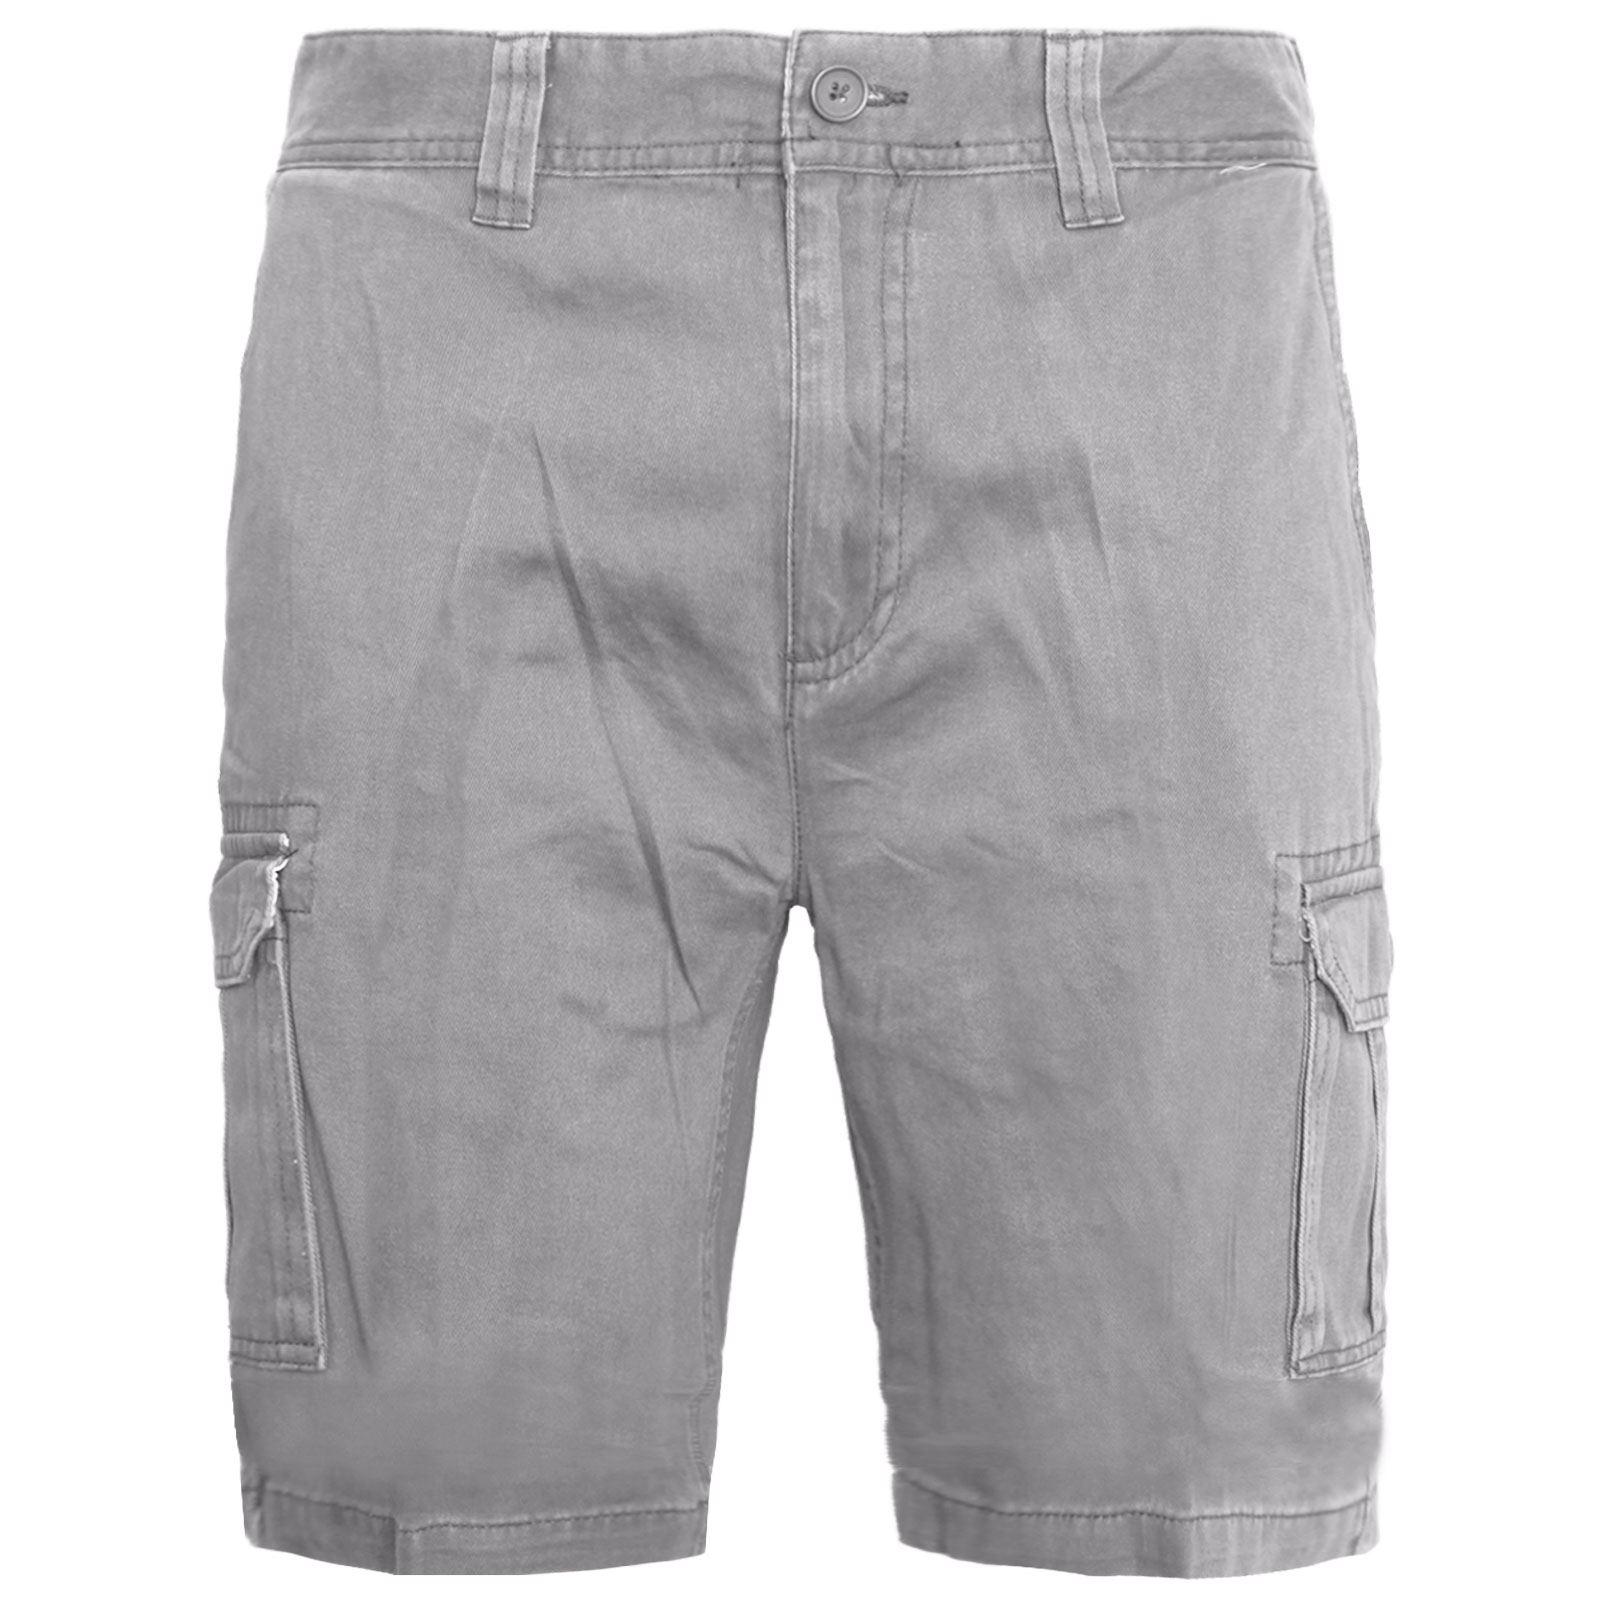 Mens-Multi-Pocket-Cargo-Shorts-Combat-Chino-Half-Pants-100-Cotton-Work-30-46 thumbnail 8